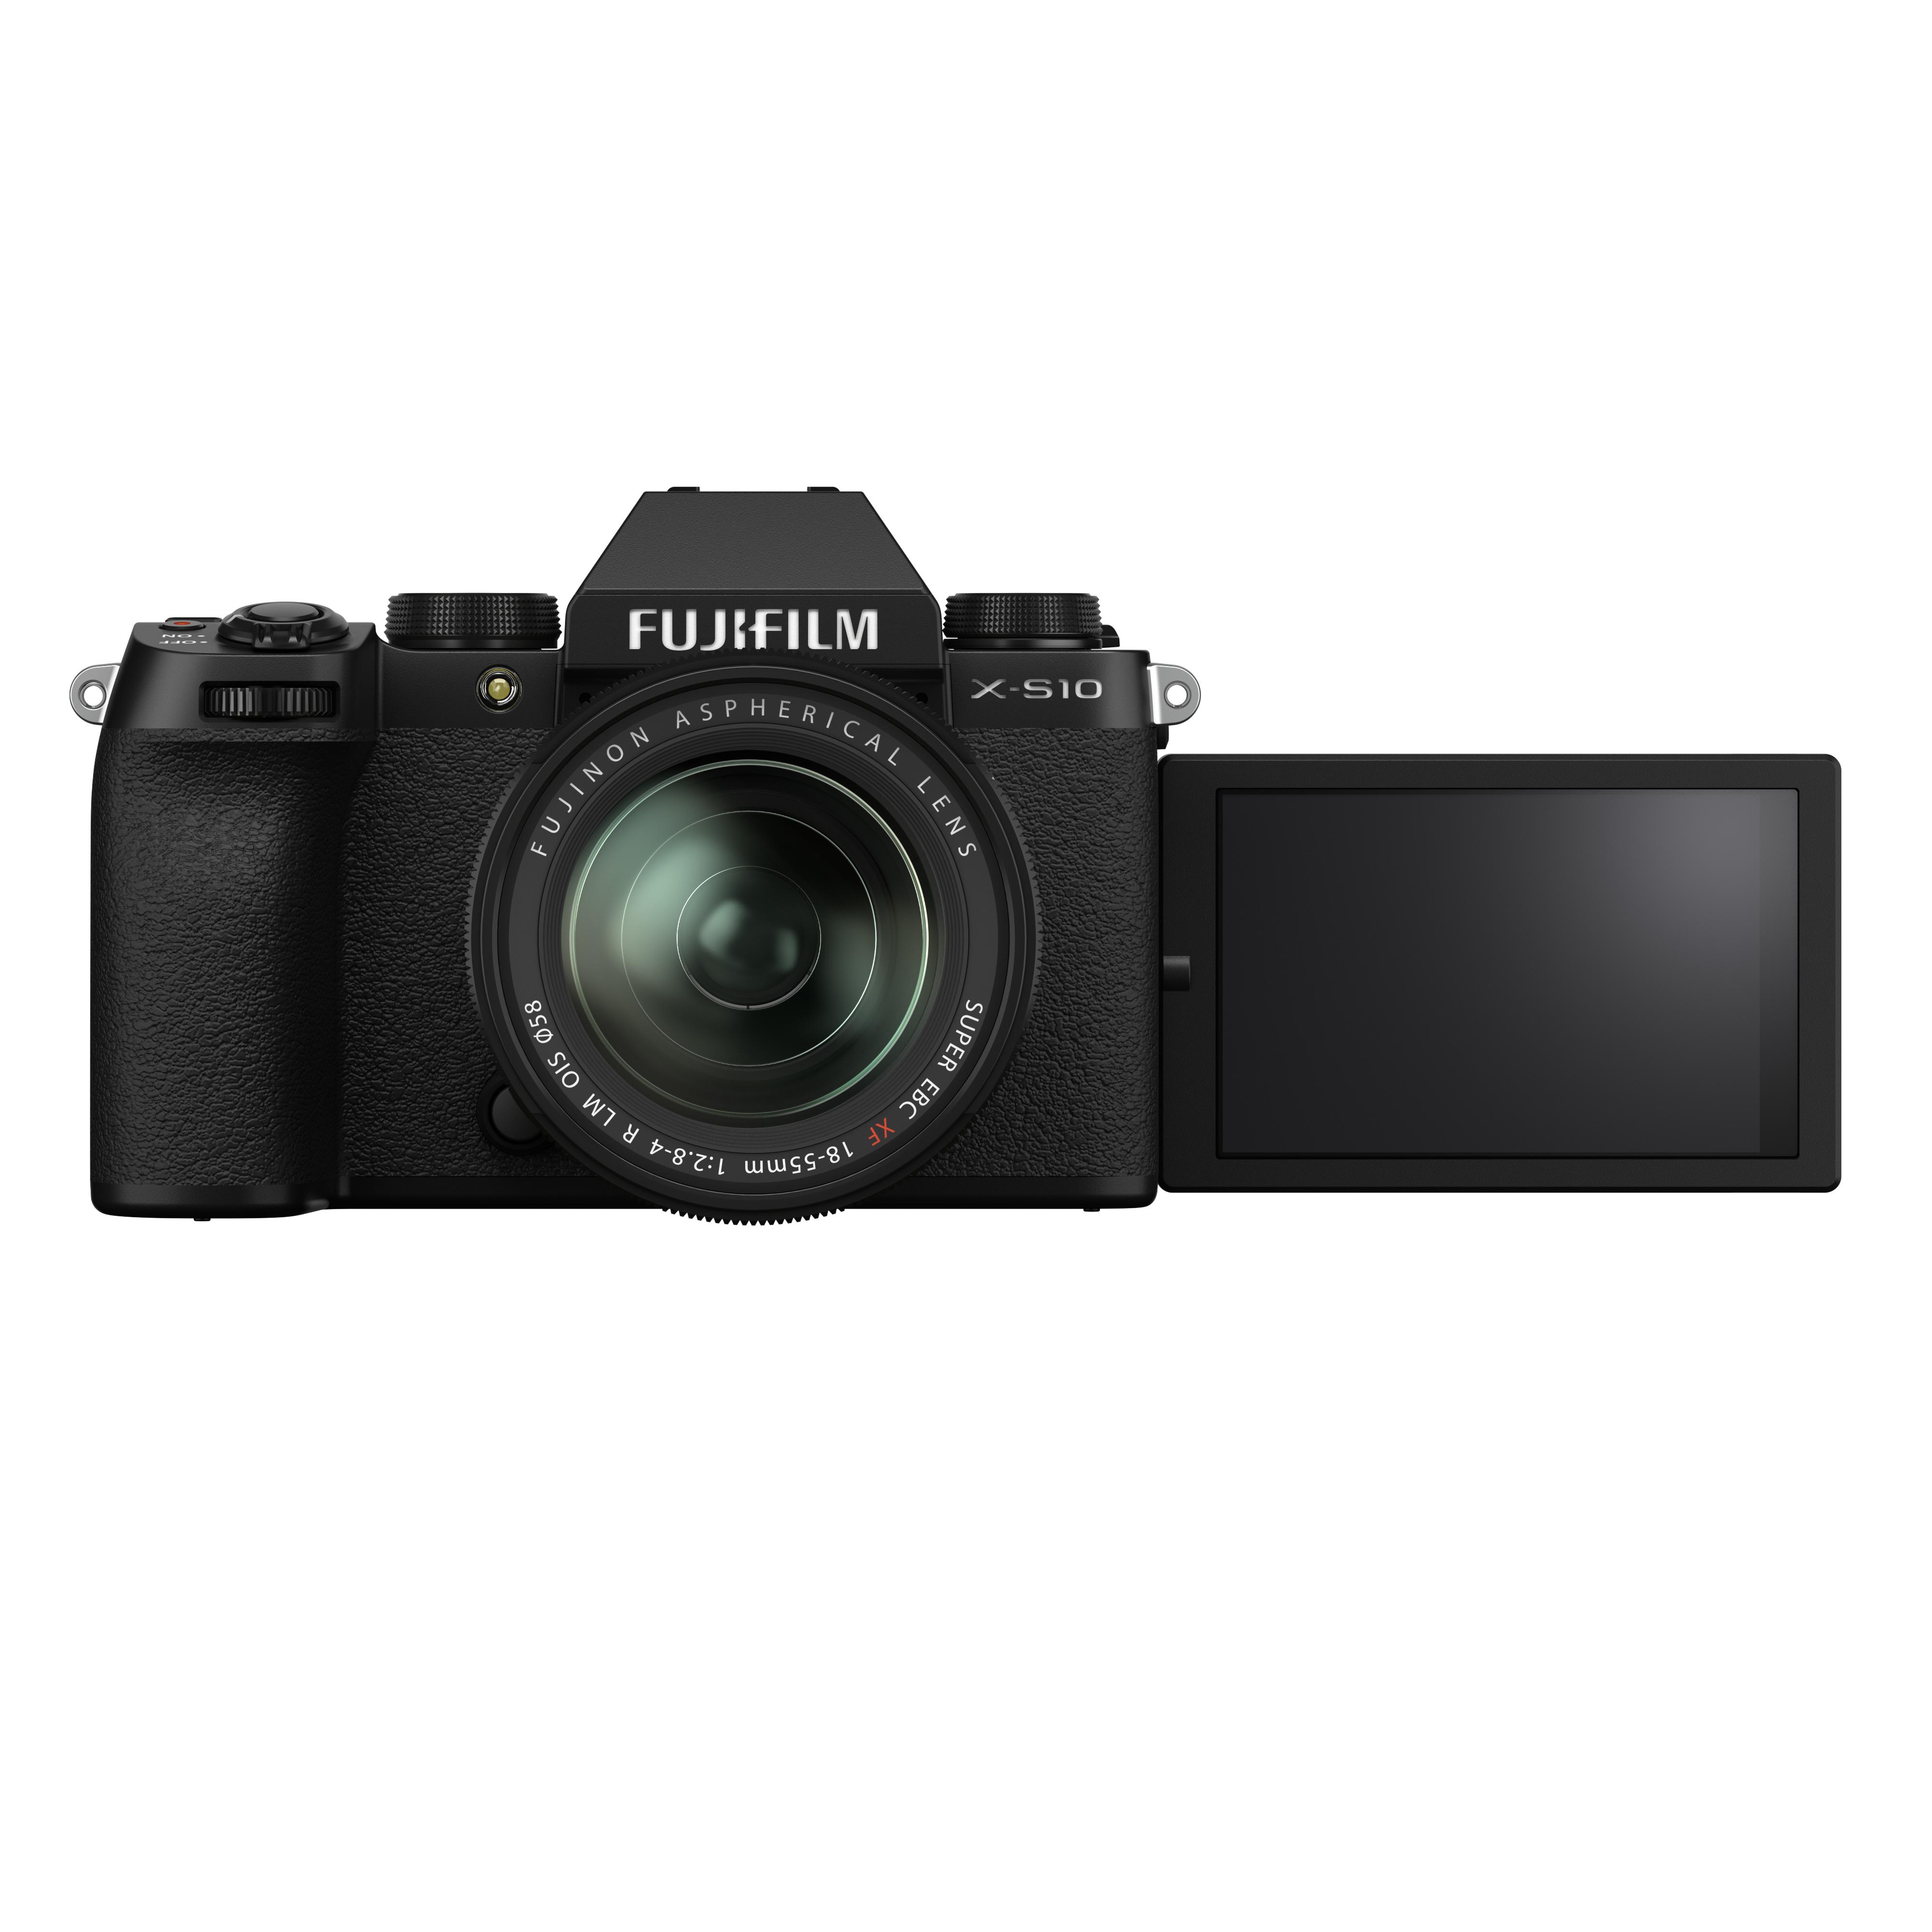 Fujifilm Introduces X-S10 Mirrorless Digital Camera 3